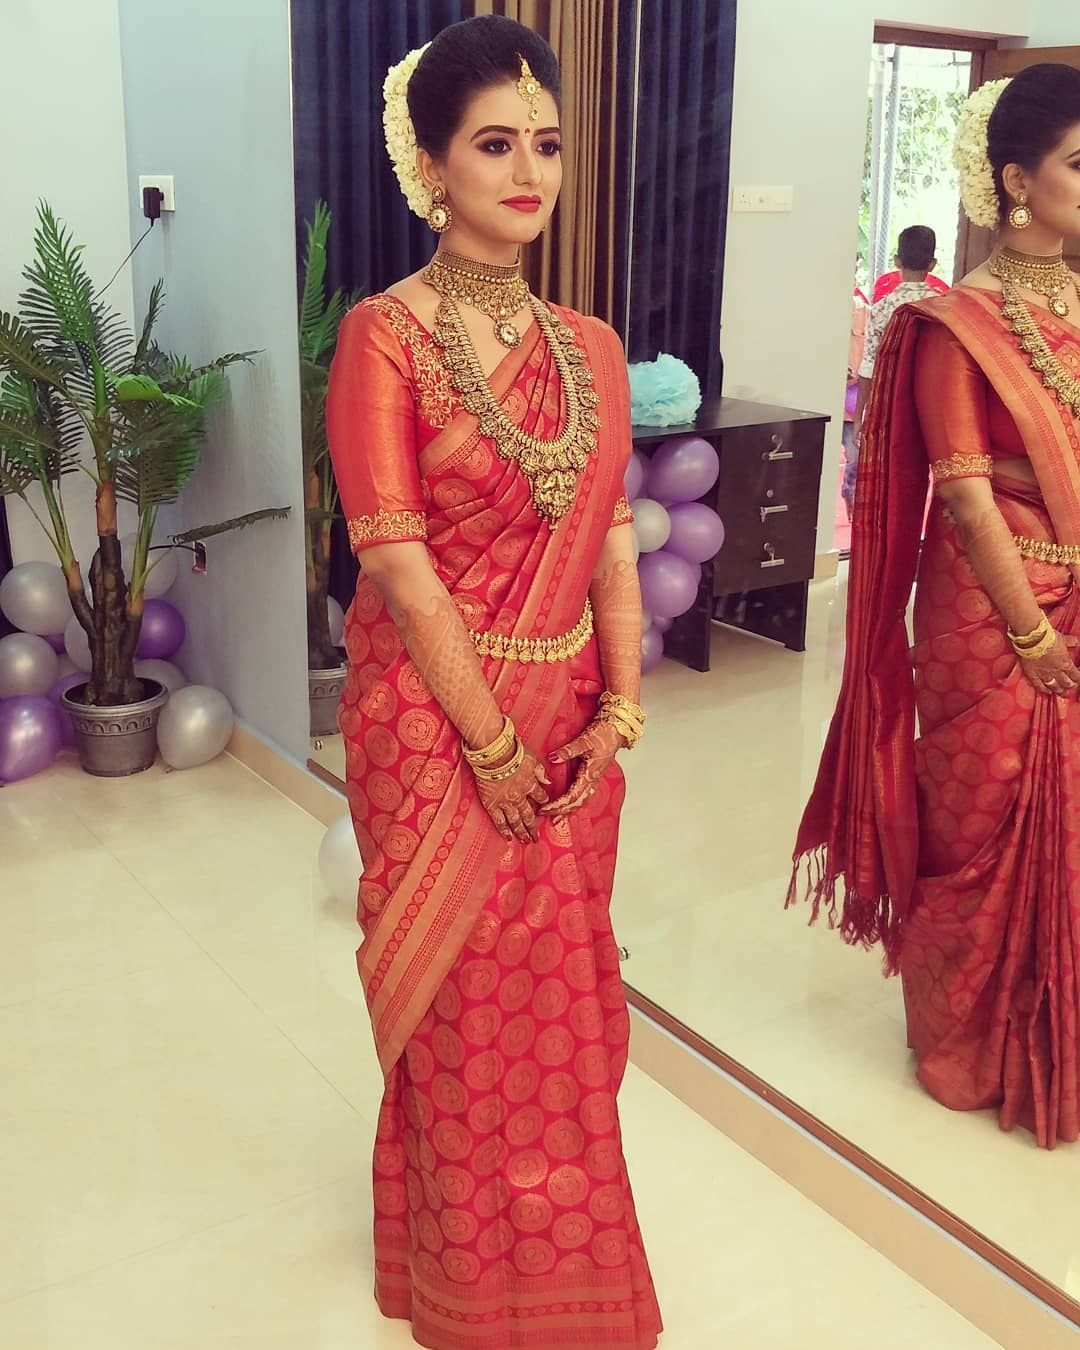 Kerala Wedding Bridal Images: Hindu Wedding Makeup Work In Kerala ### 💅💅💅💅💄💄💄💄 In 2019